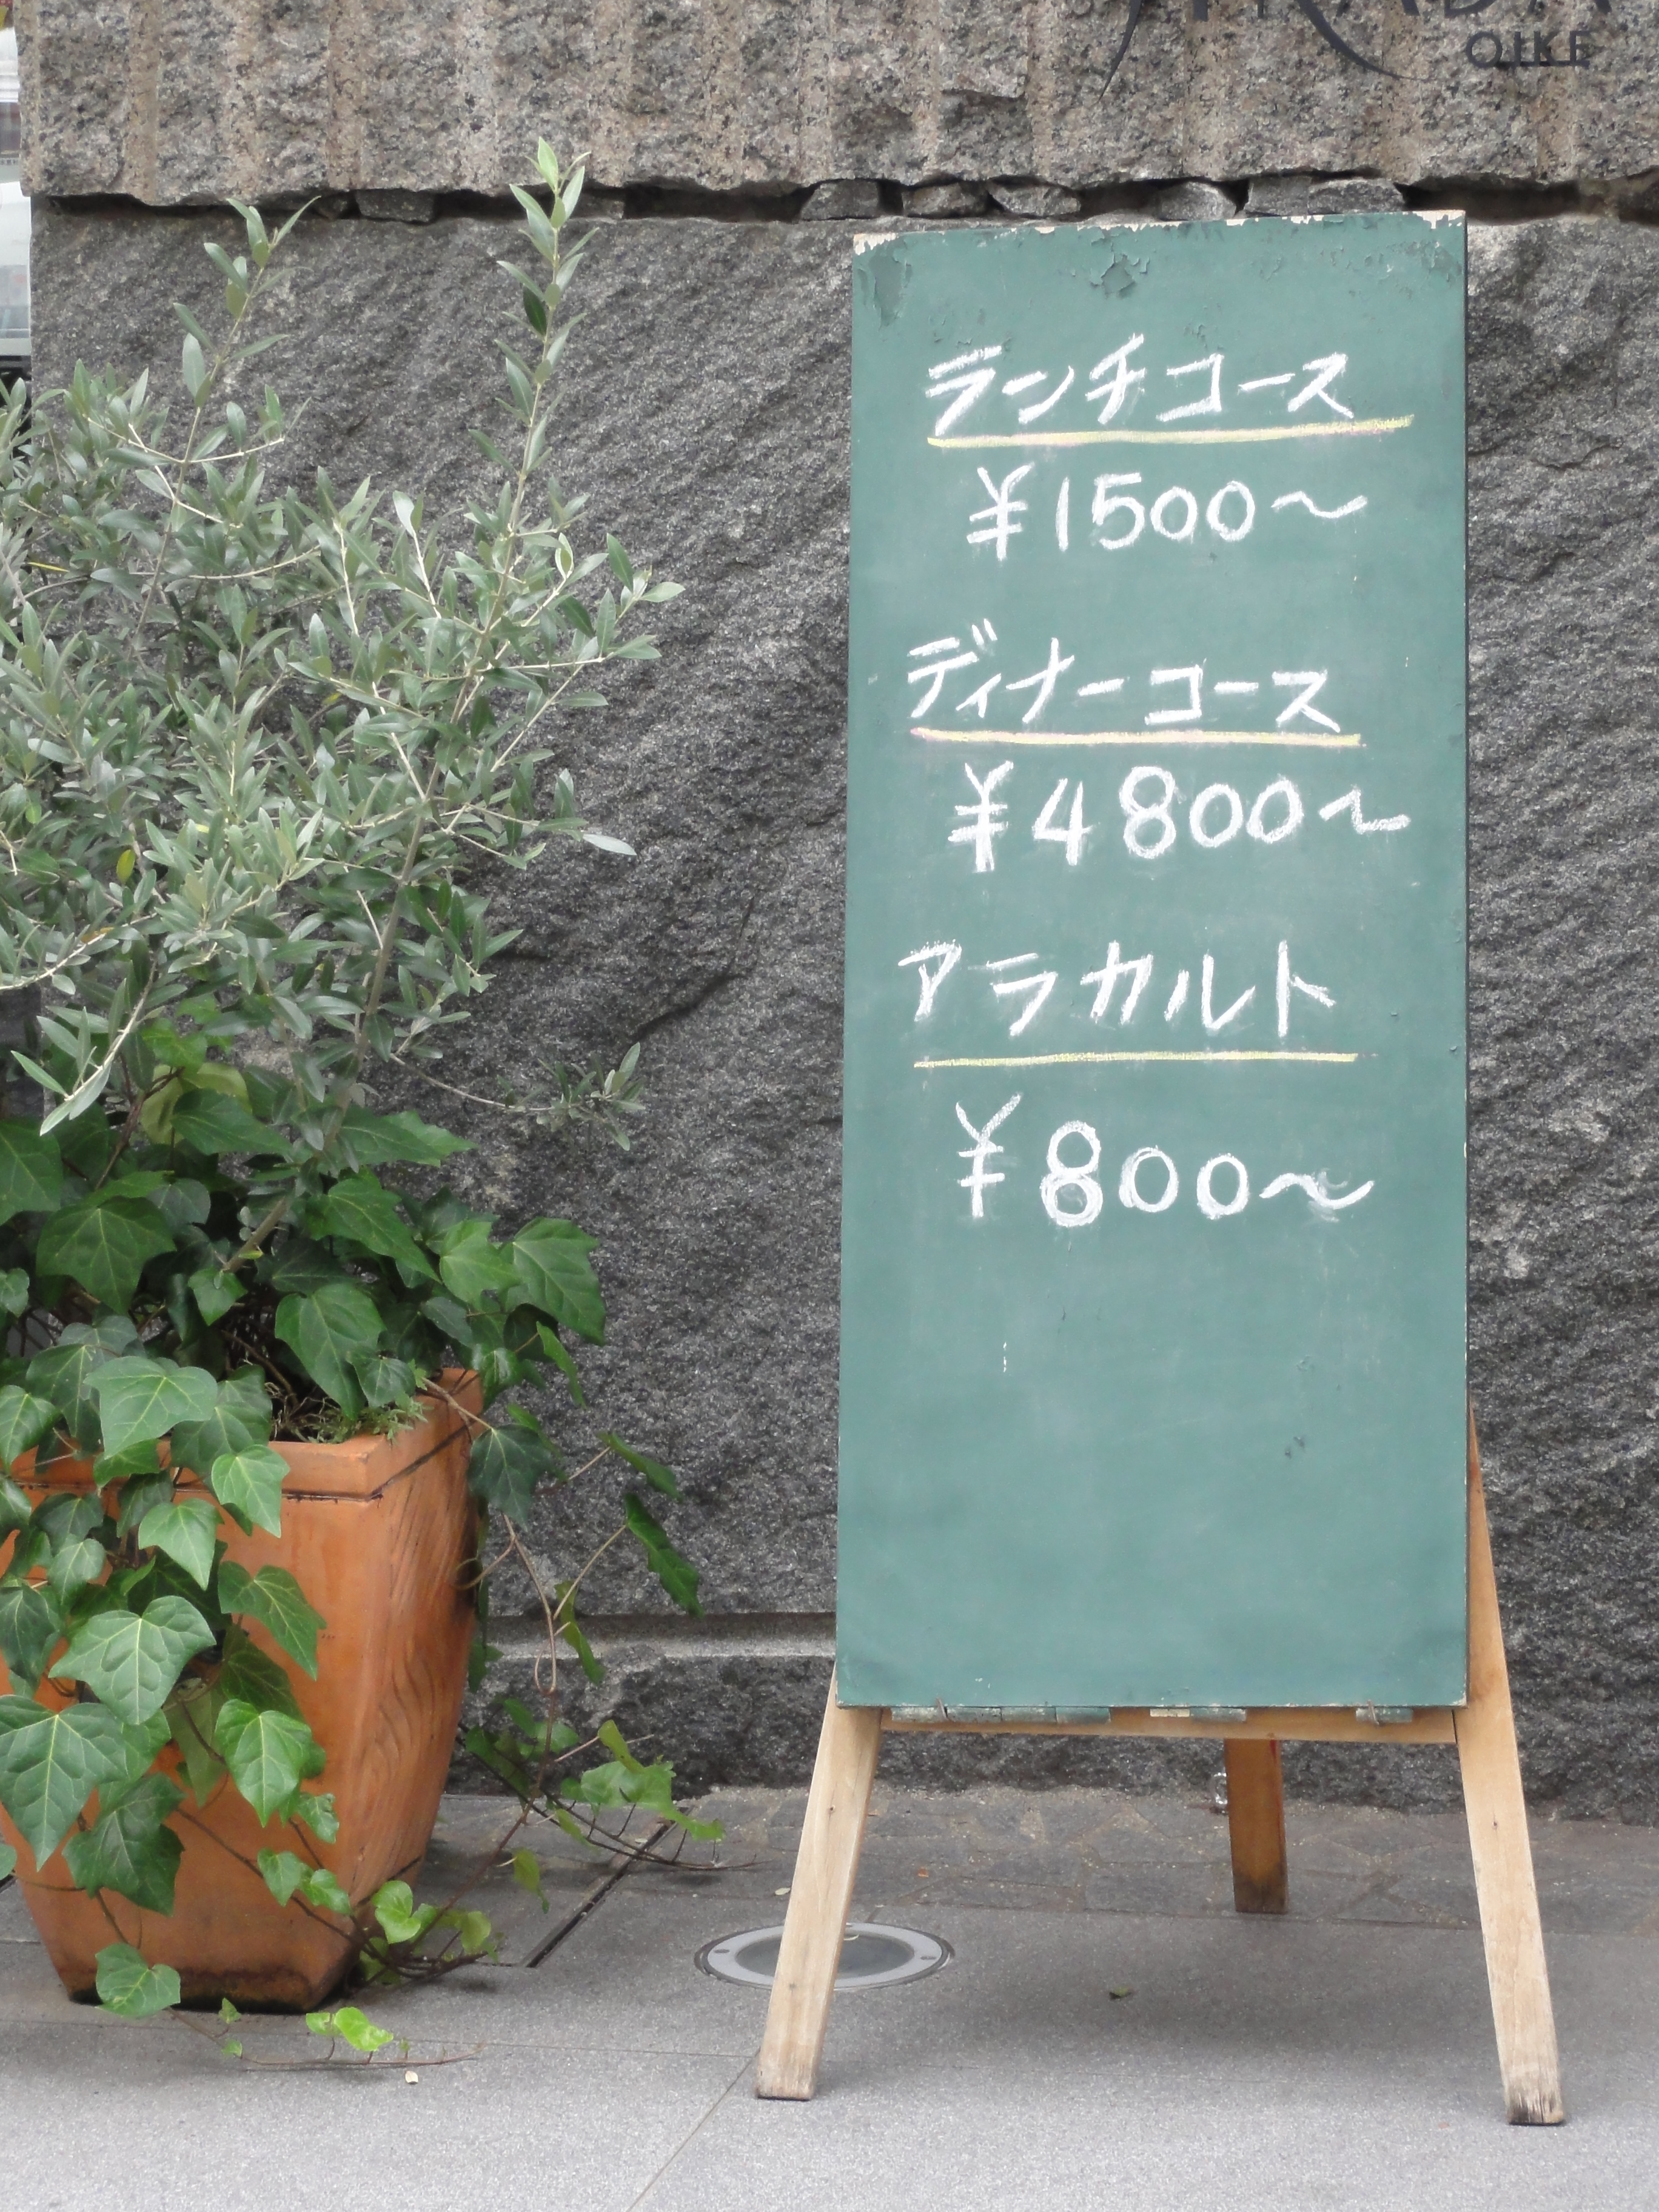 Restaurant's sign in katakana Japanese alphabet